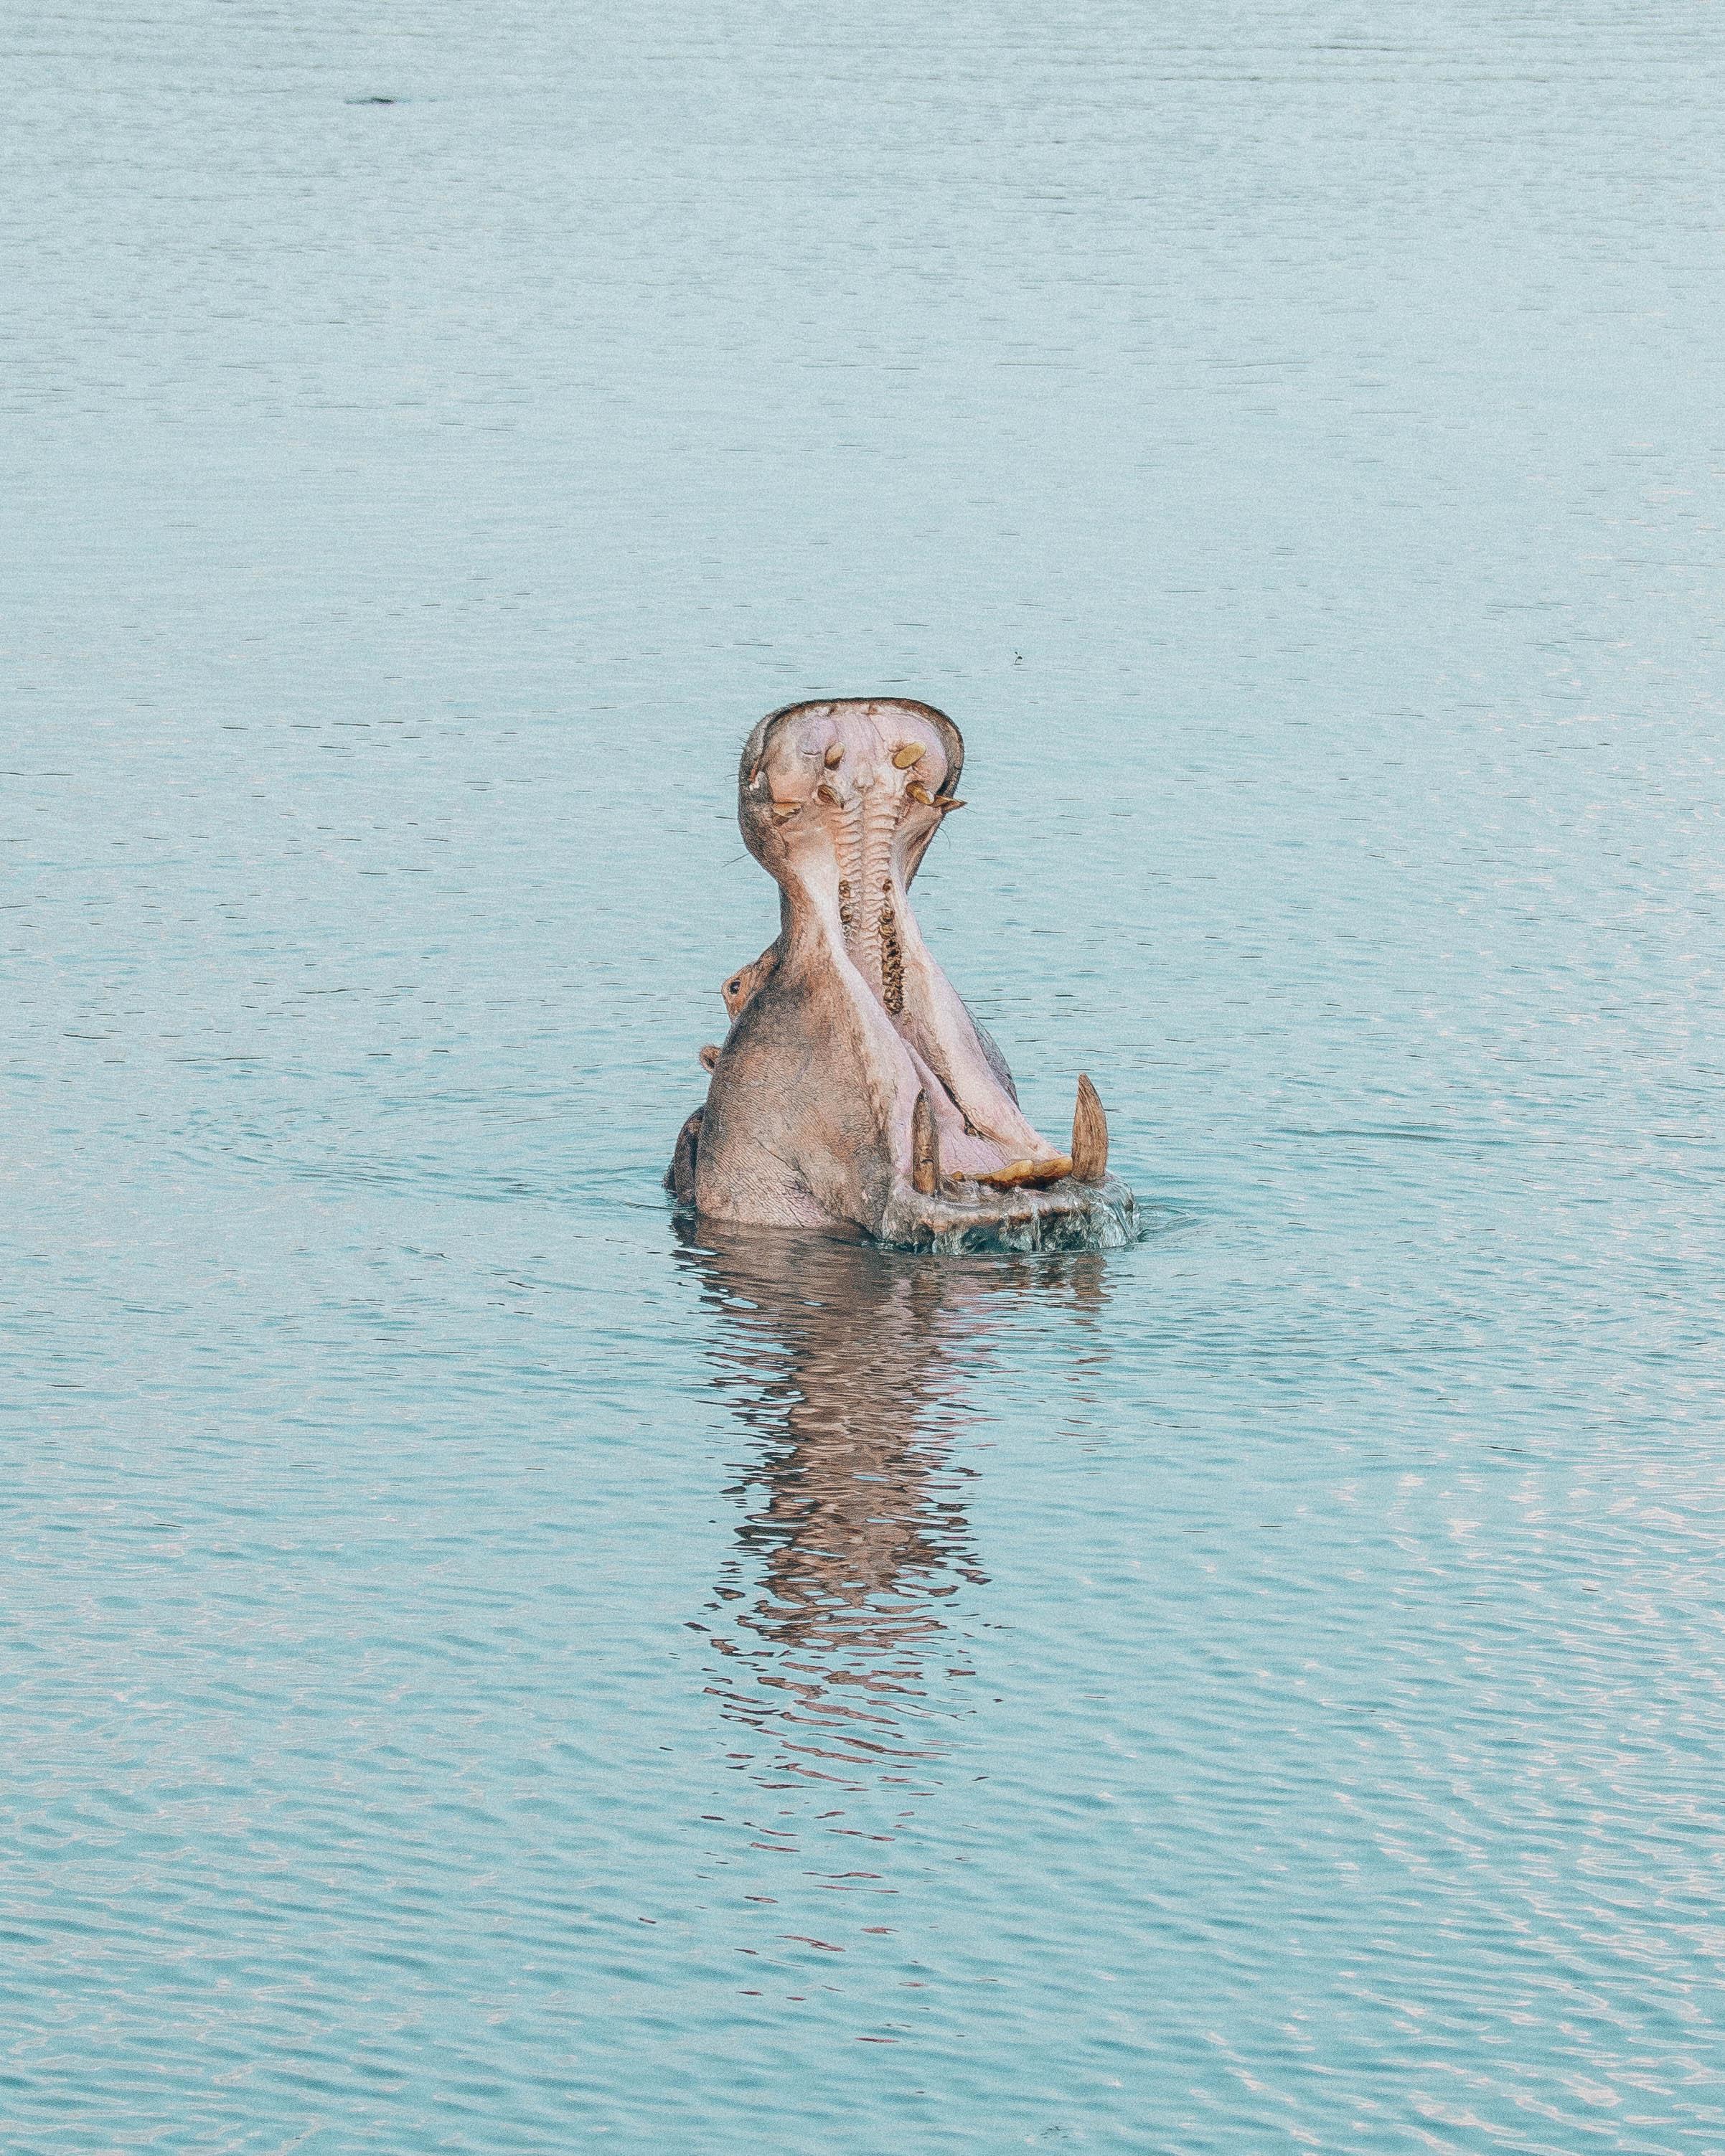 Hippo yawns!